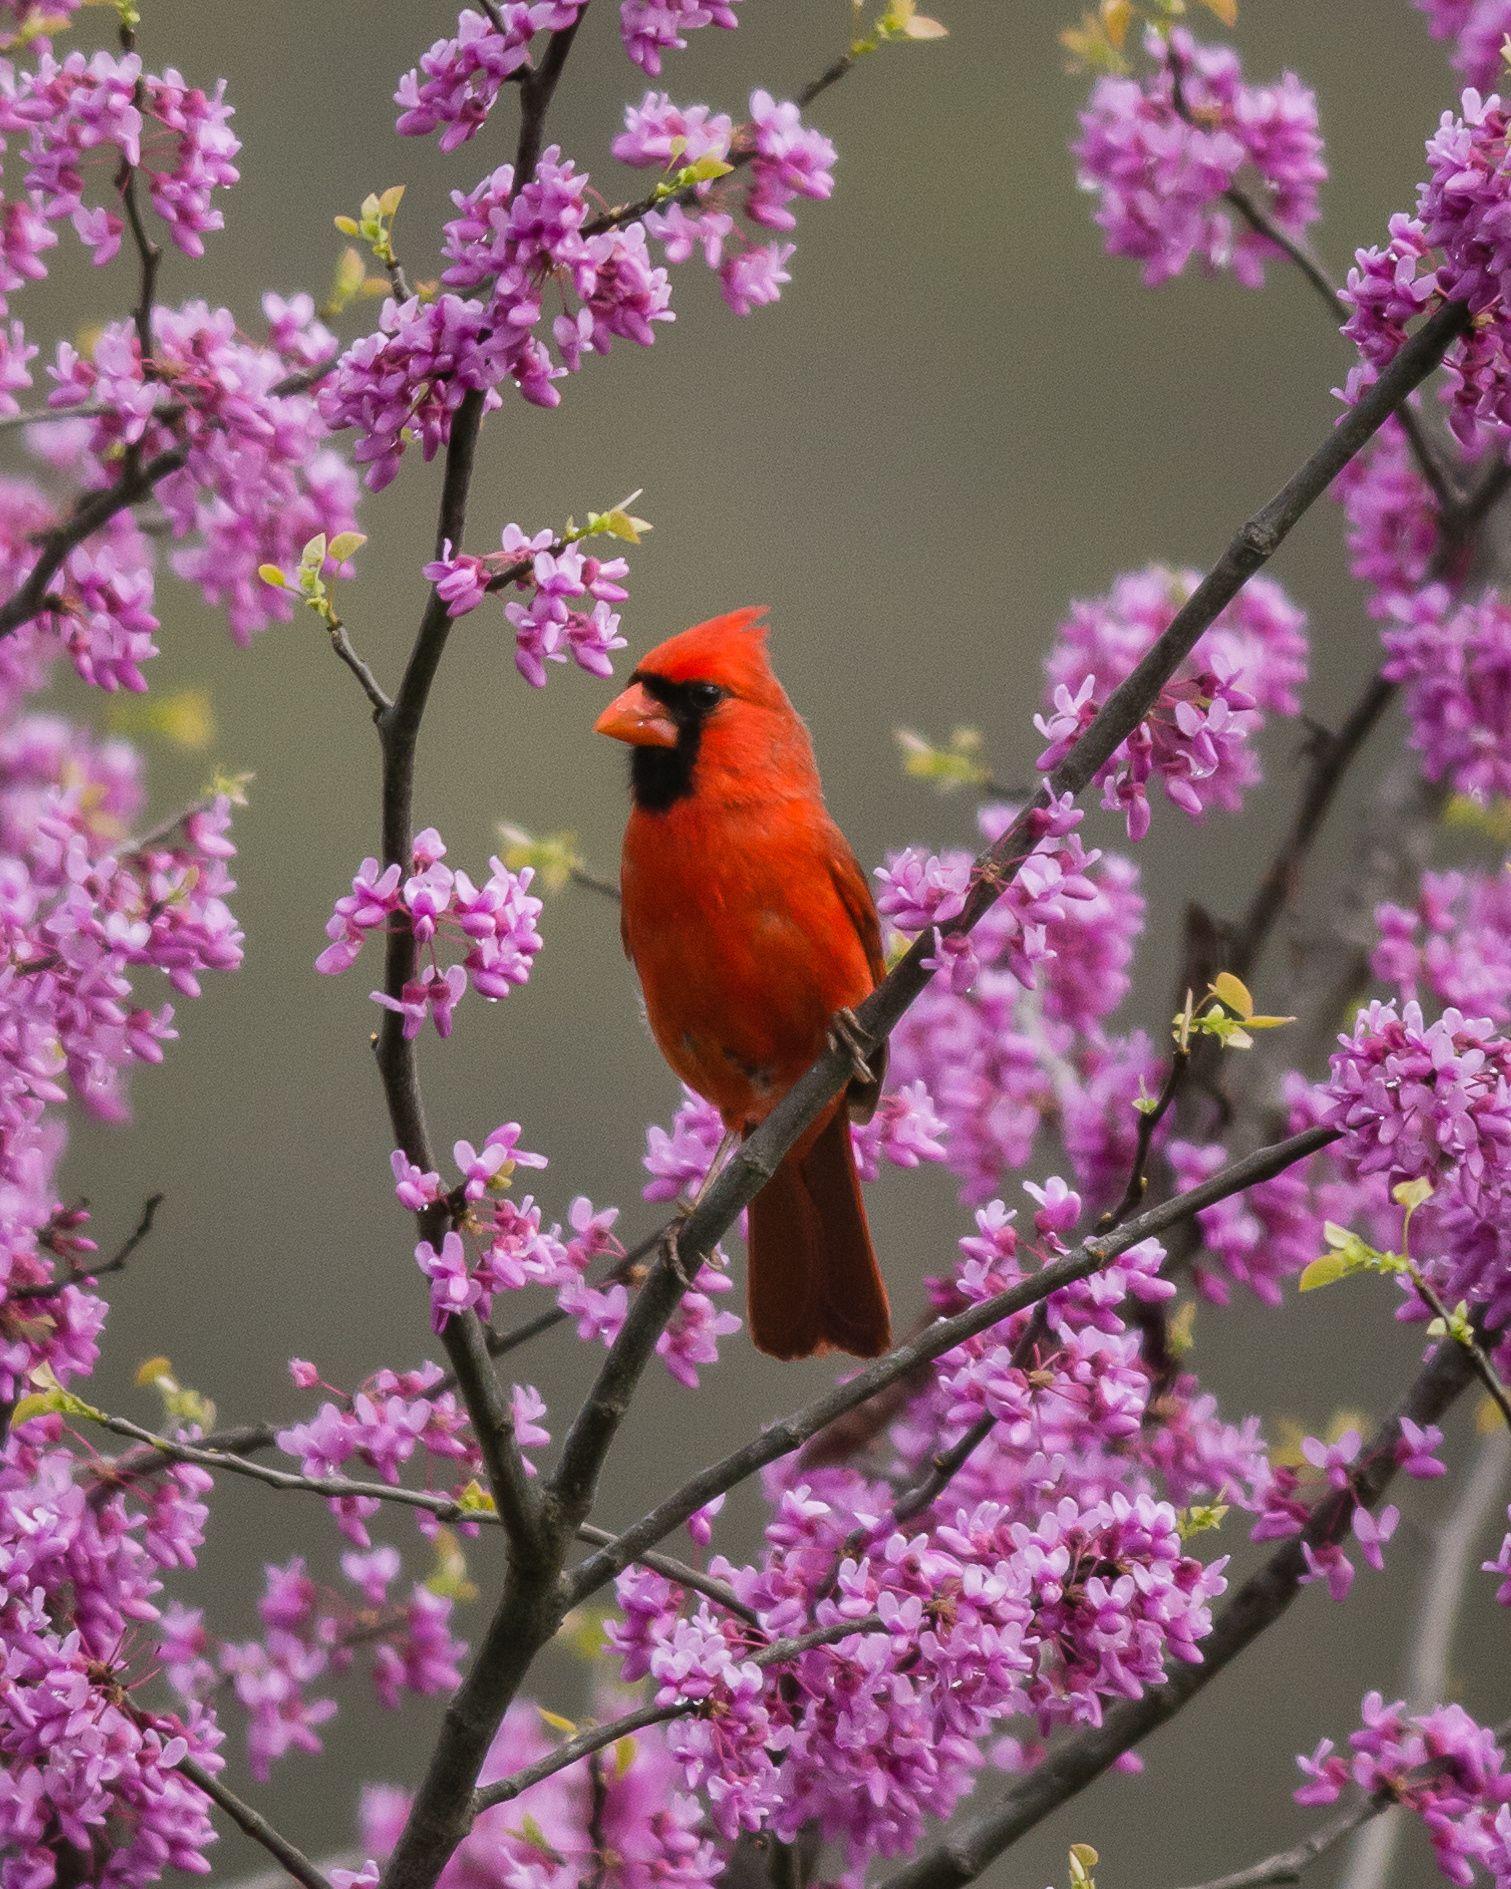 maine state bird flower and tree